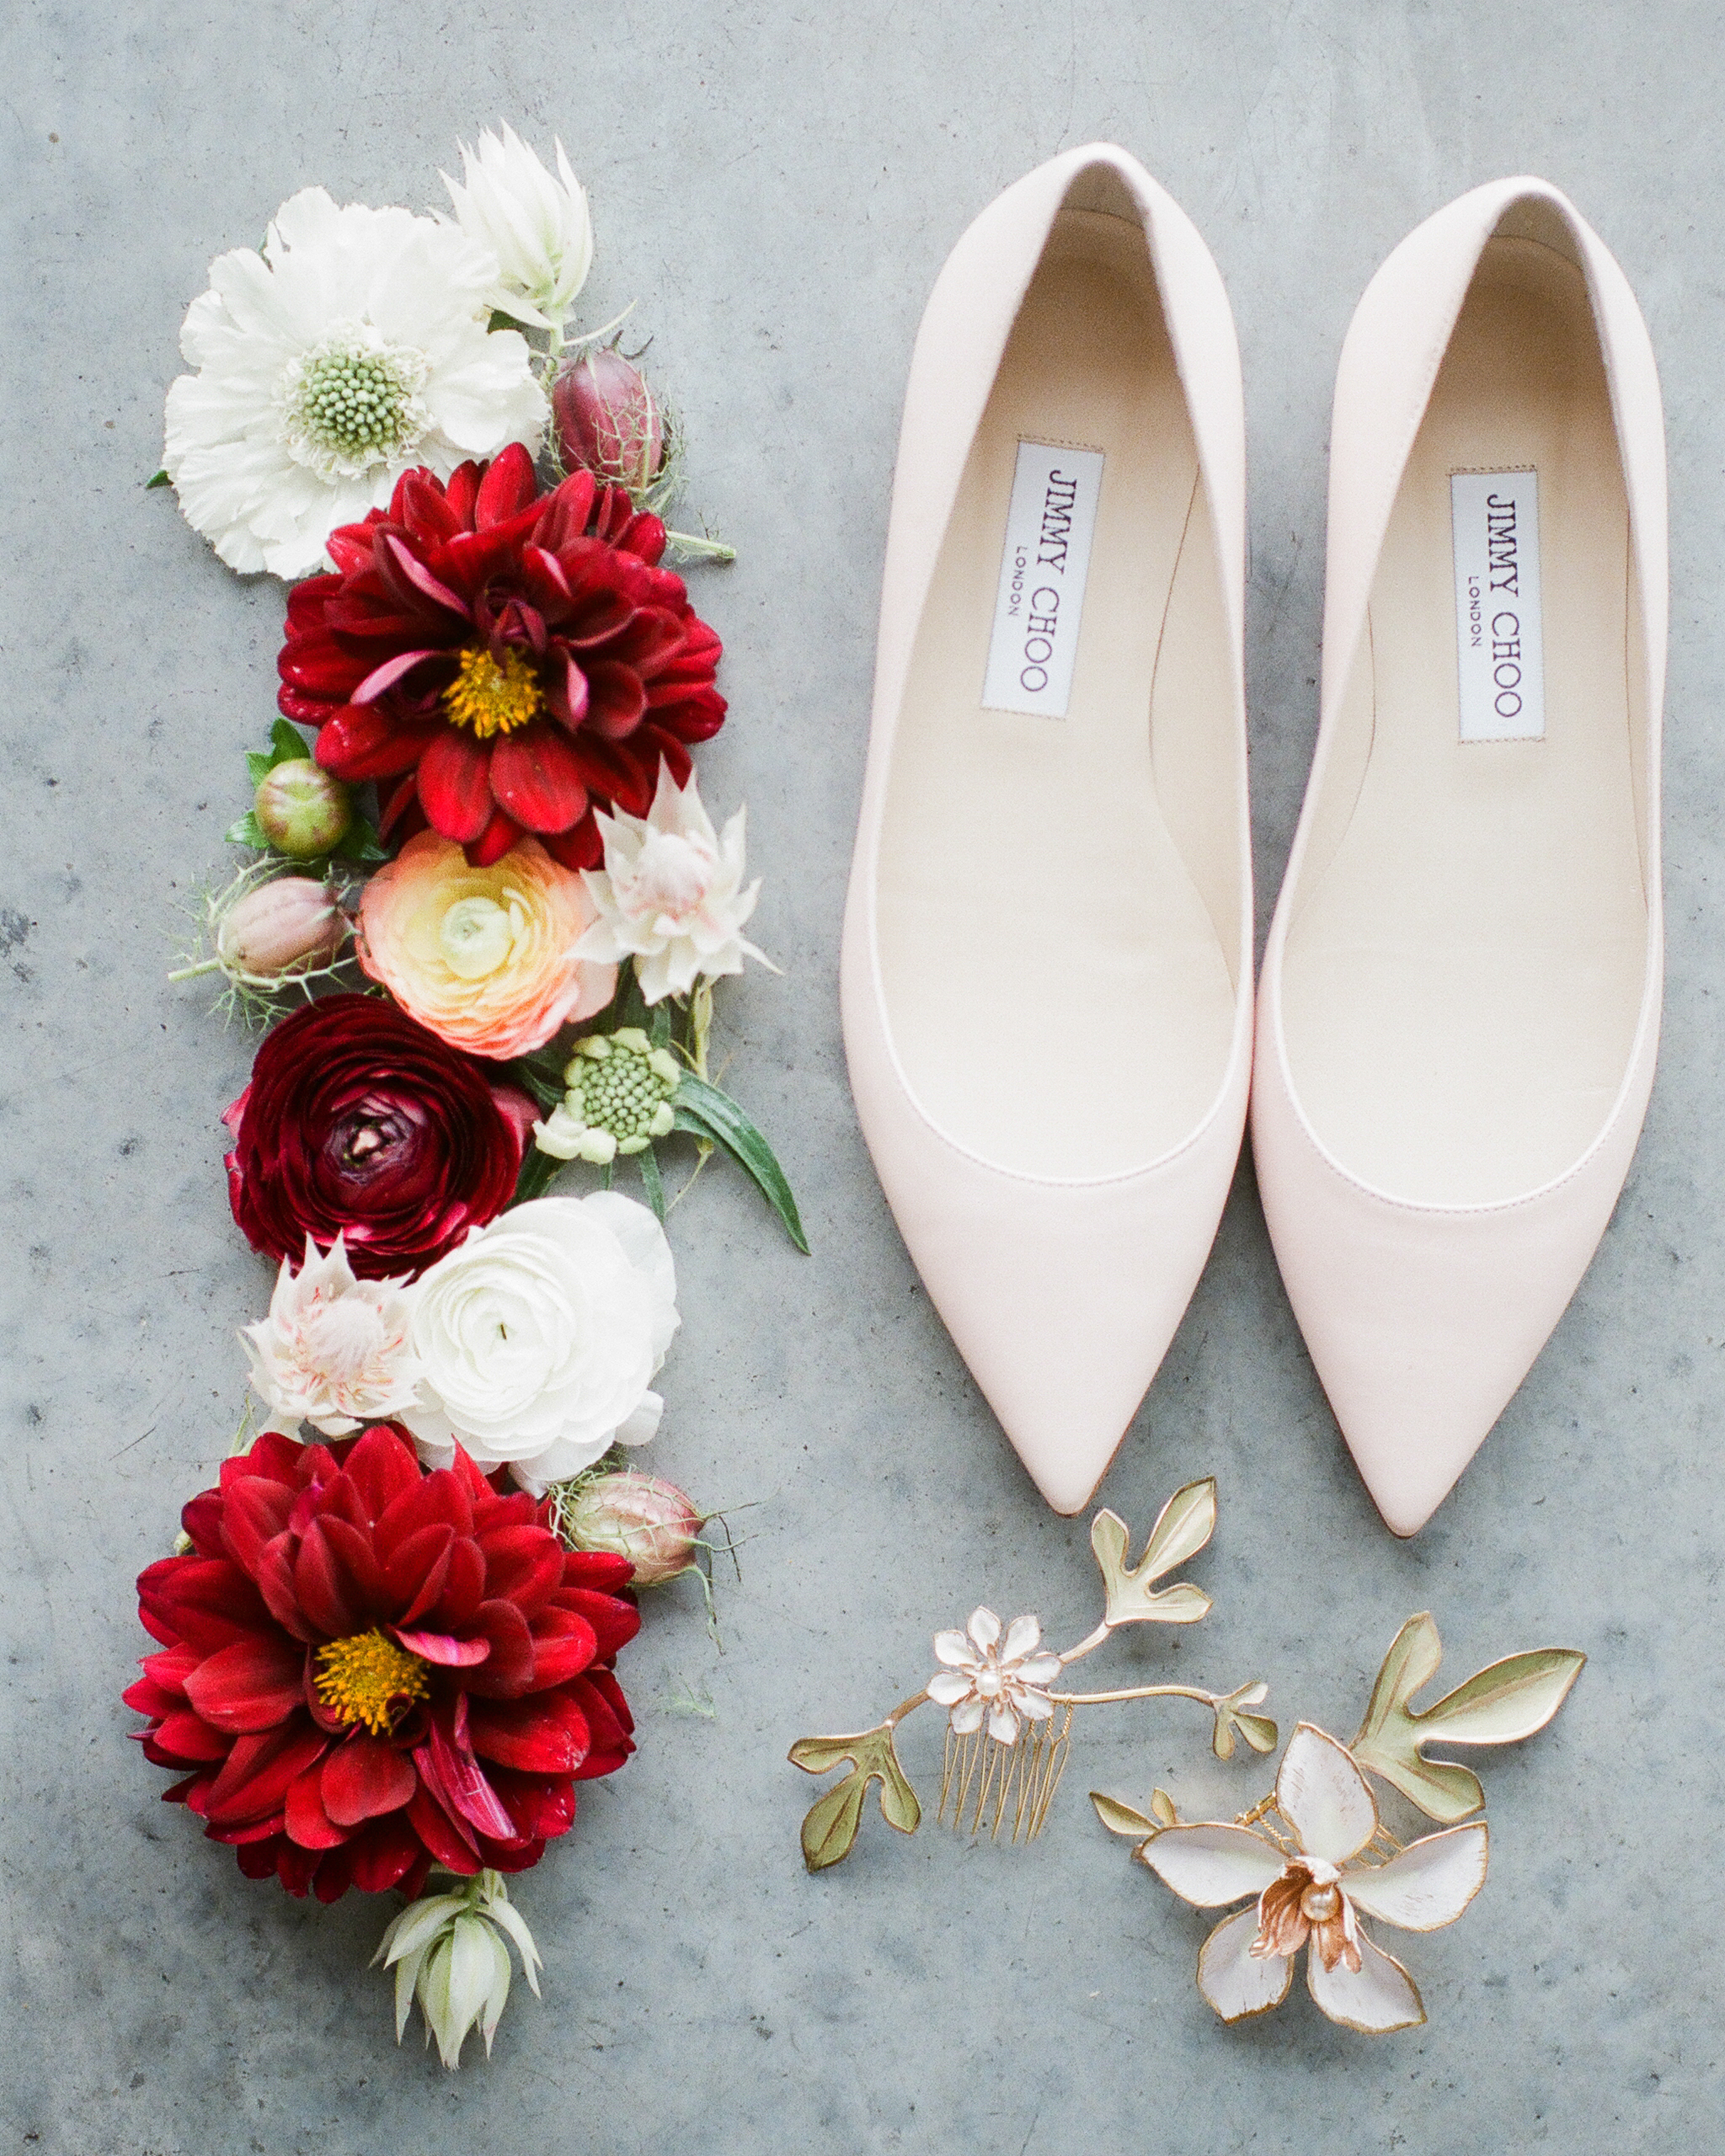 caitlin-michael-wedding-accessories-641-s111835-0415.jpg